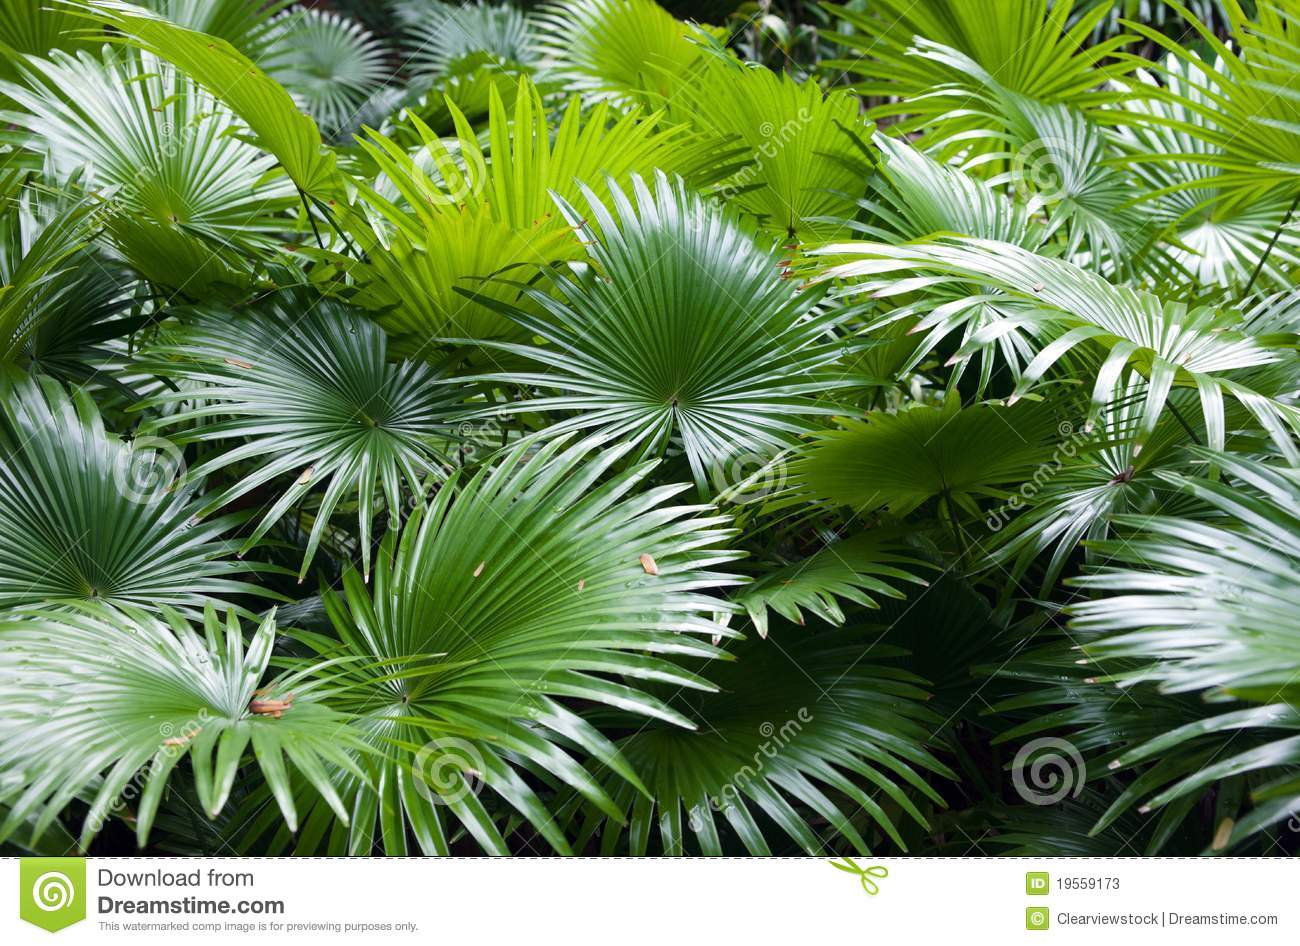 tropical-rainforest-palm-background-19559173.jpg